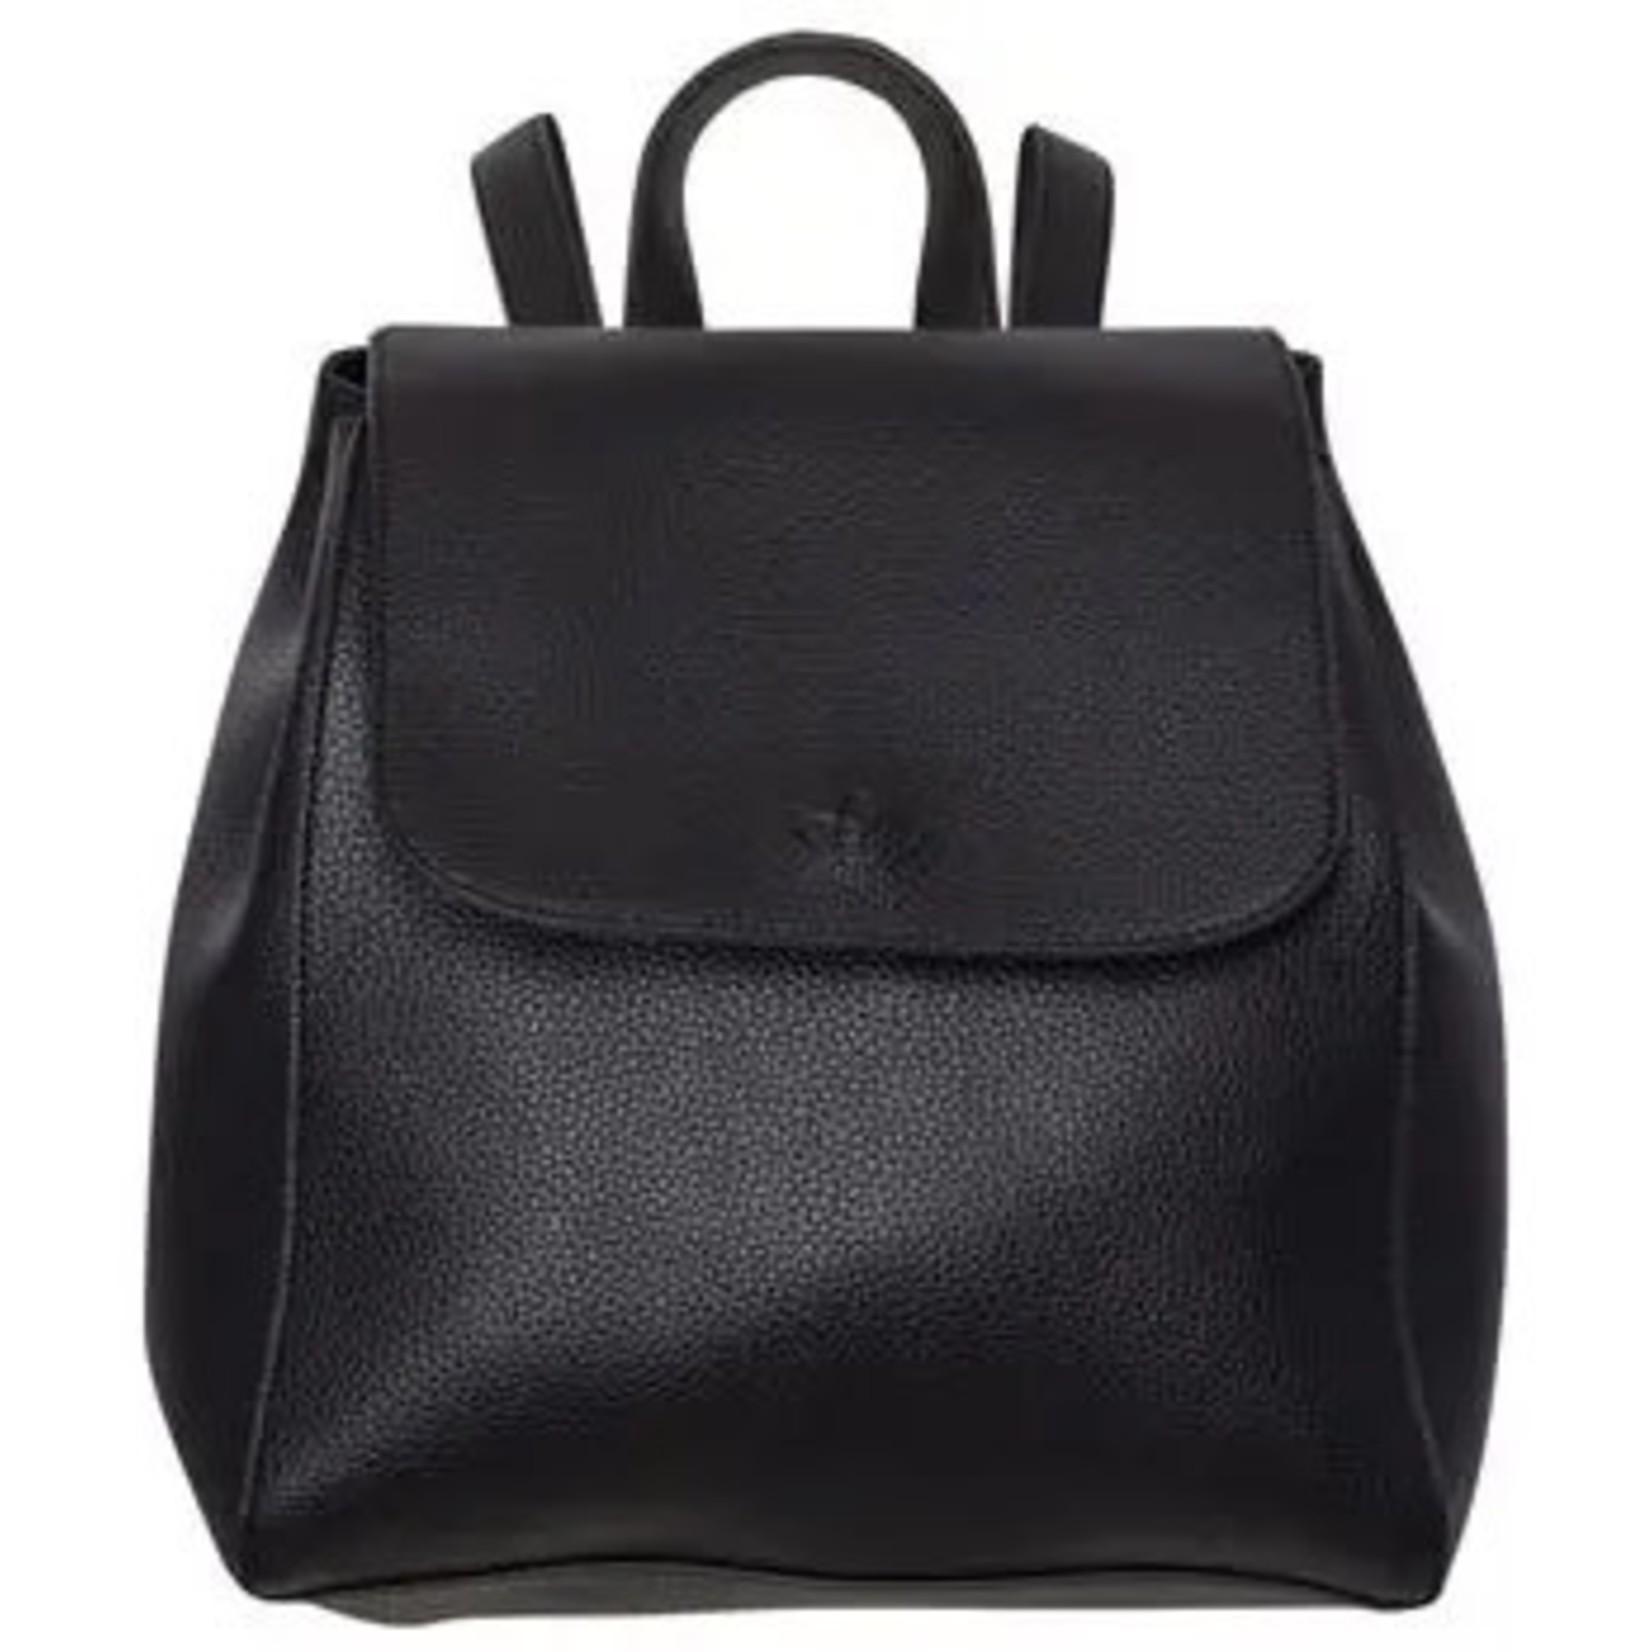 Karma Bag: Purse Backpack | Black